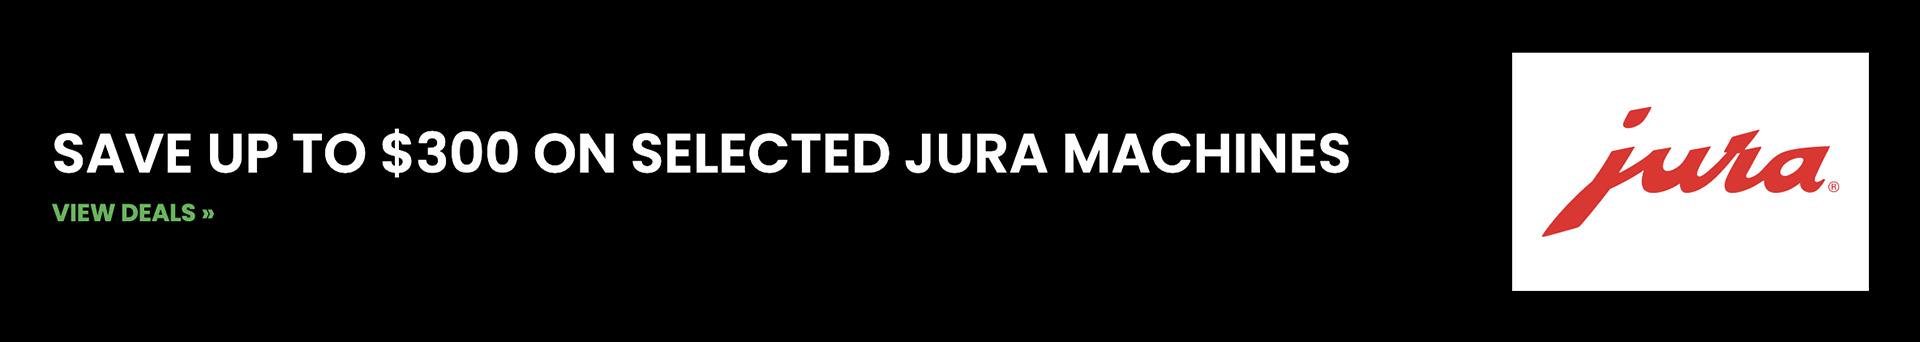 jura-sale-banner-300